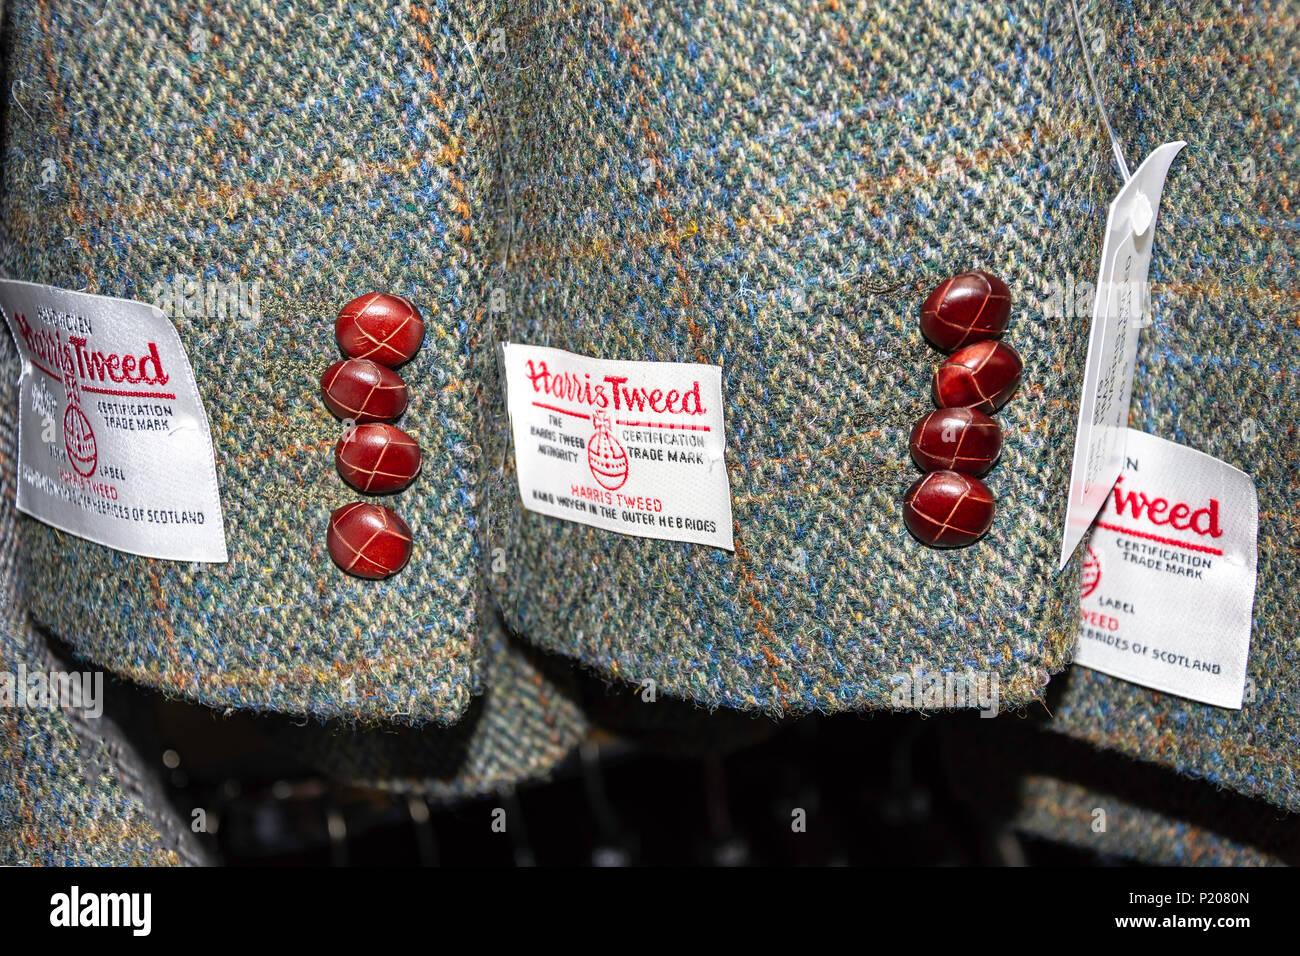 Men's Harris Tweed jacket sleeves, Tarbert (Tairbeart), Isle of Harris, Outer Hebrides, Na h-Eileanan Siar, Scotland, United Kingdom - Stock Image